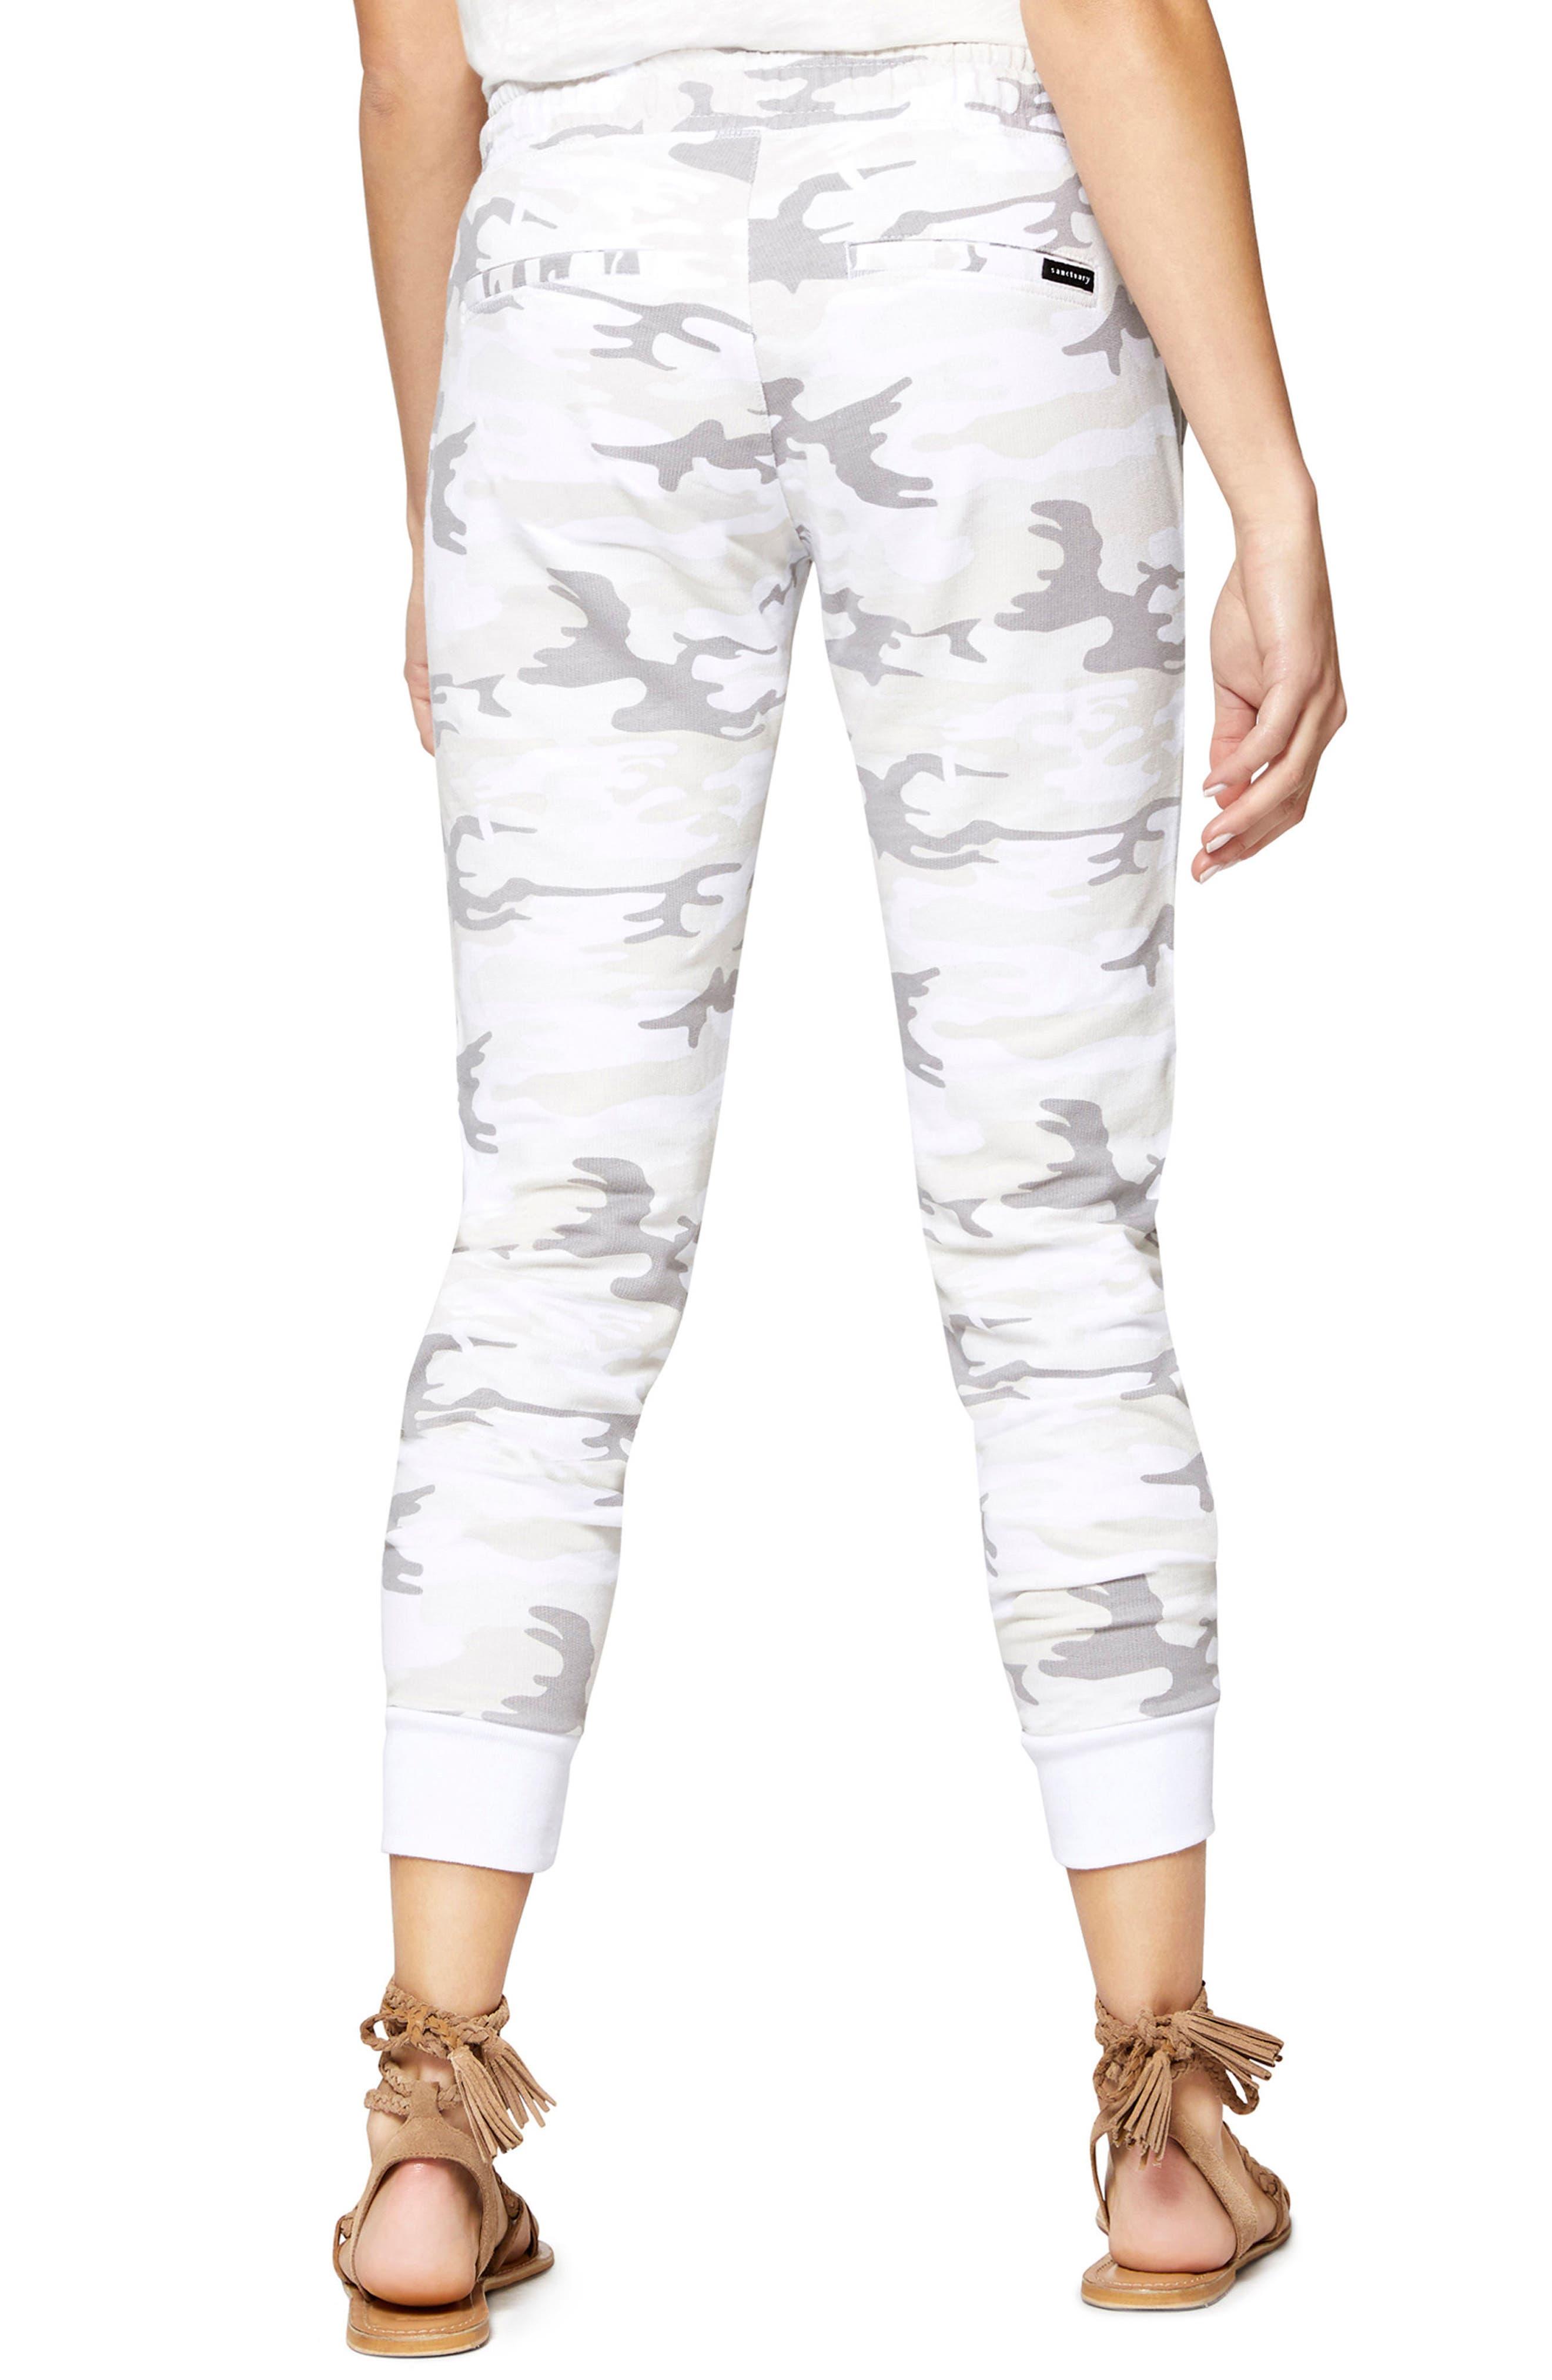 Peace Brigade Jogger Pants,                             Alternate thumbnail 2, color,                             White Camo